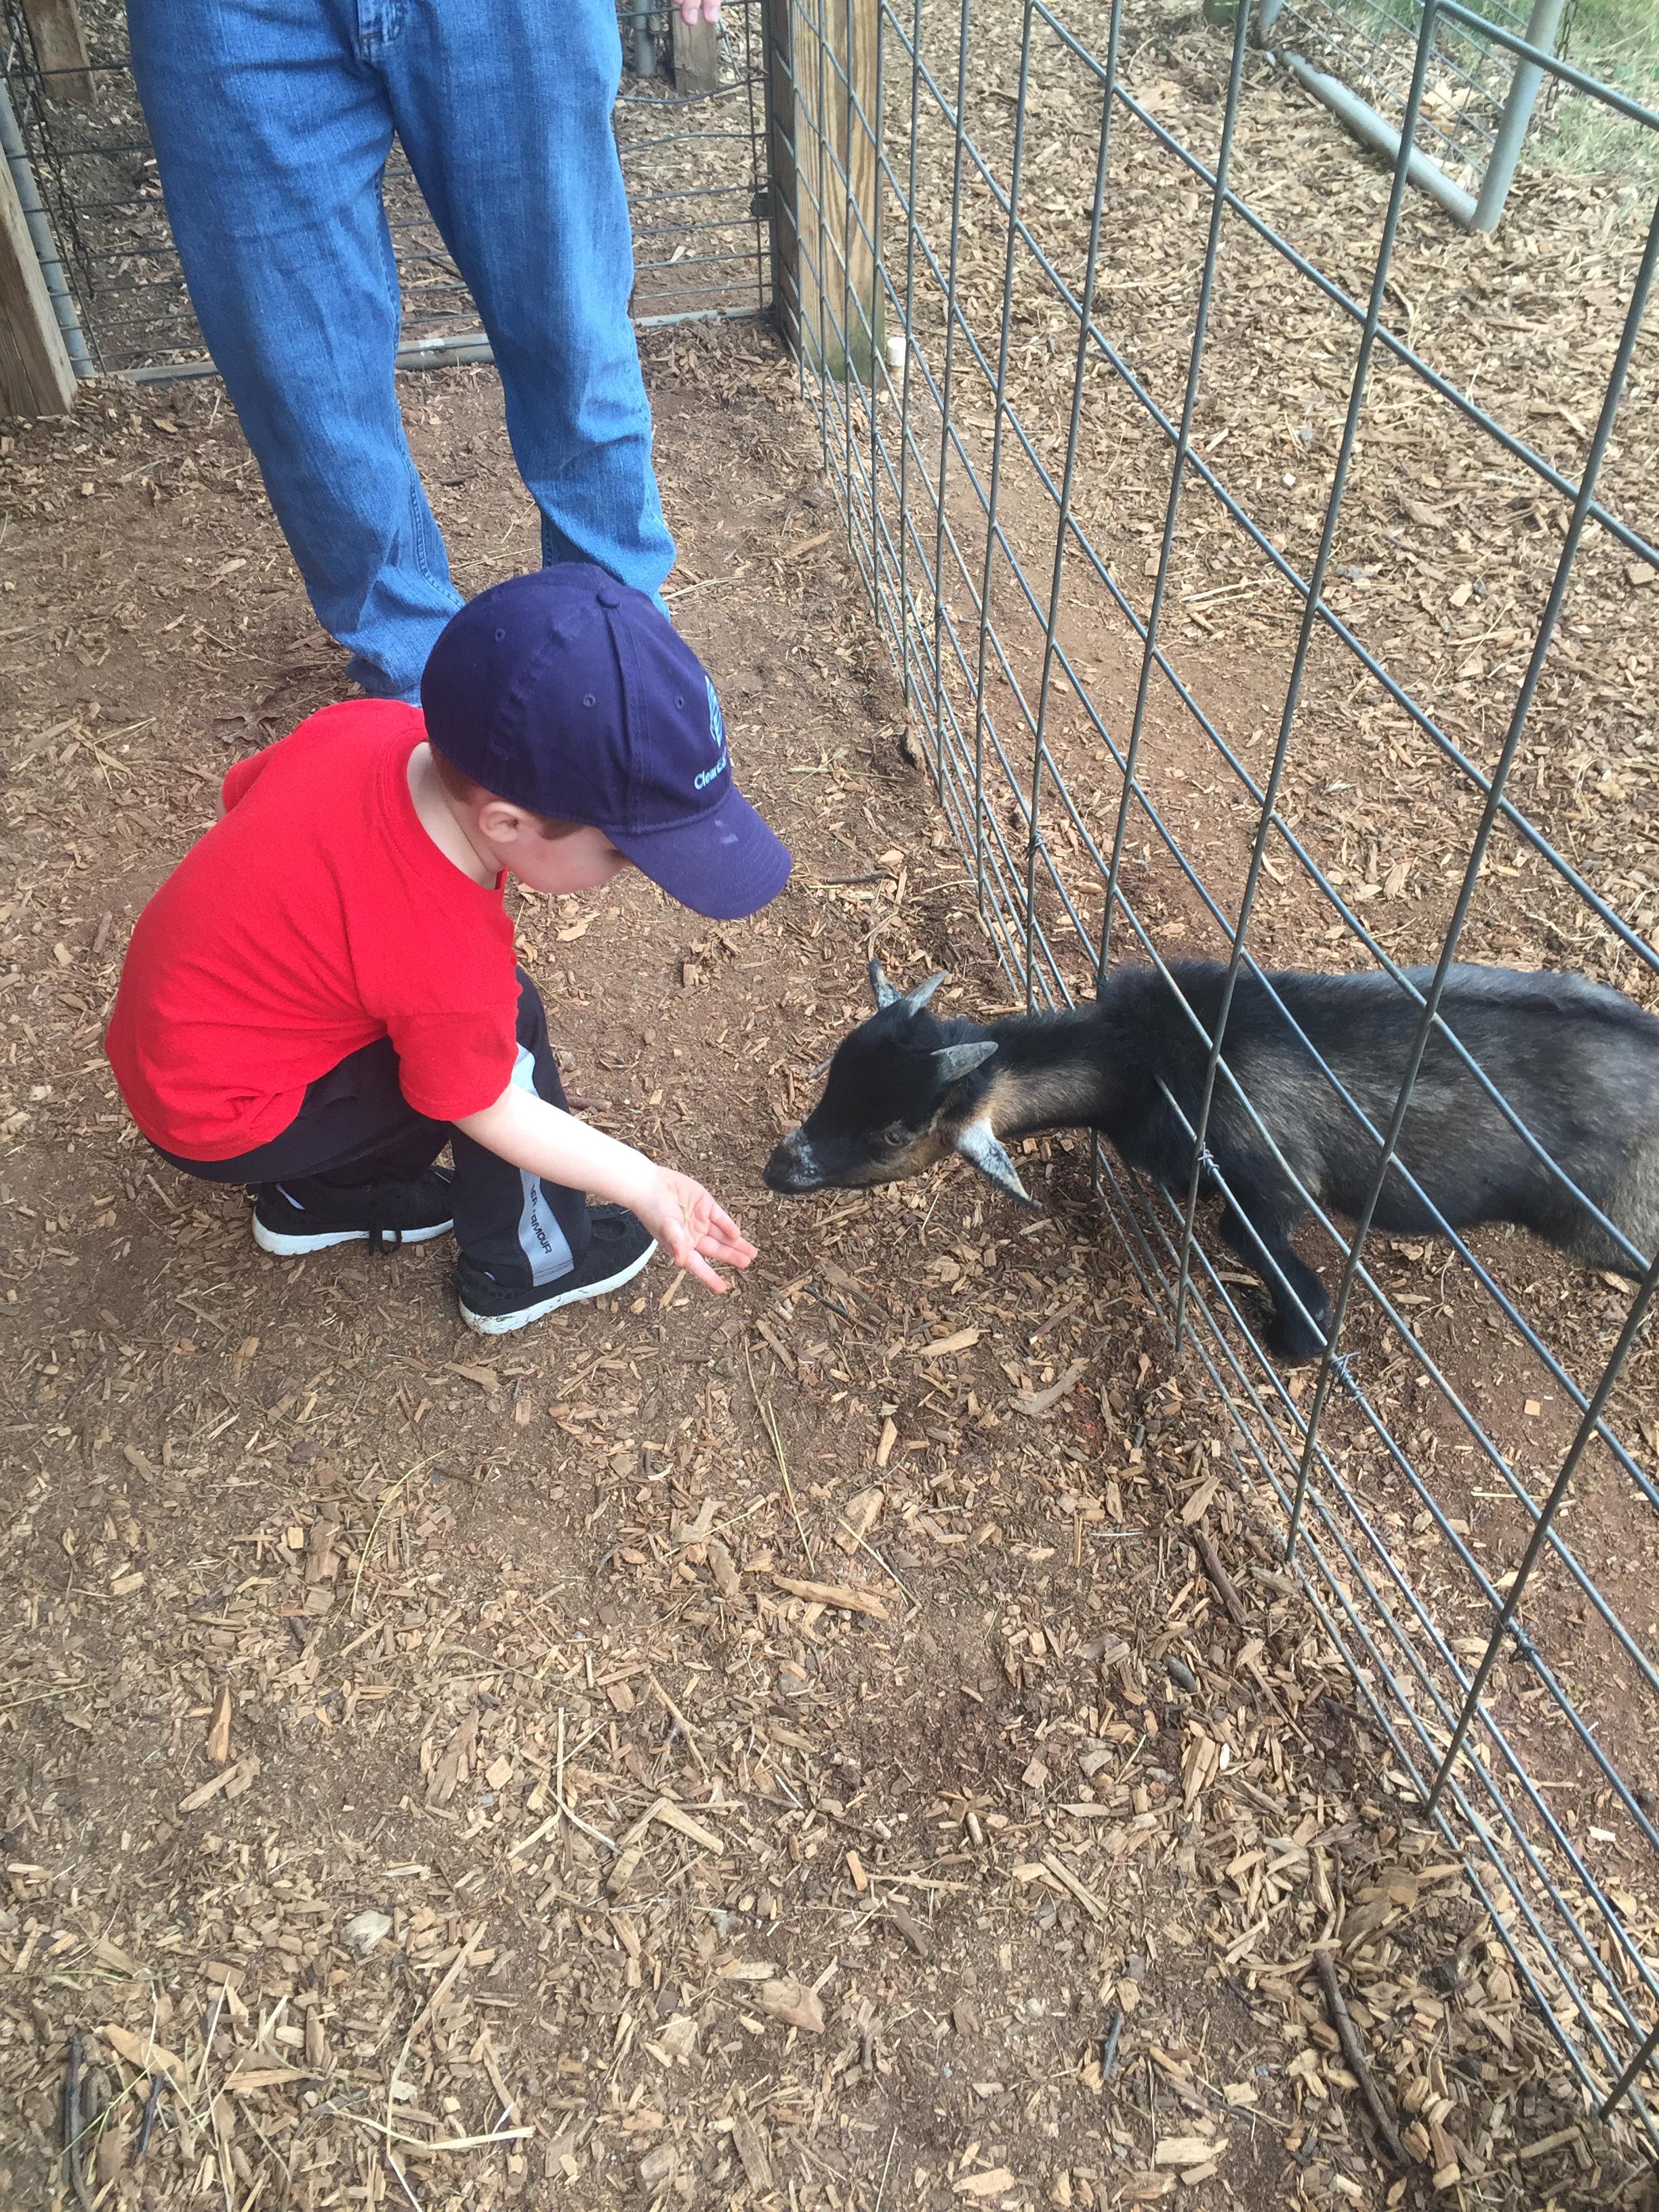 Low Budget Birthday - Farm